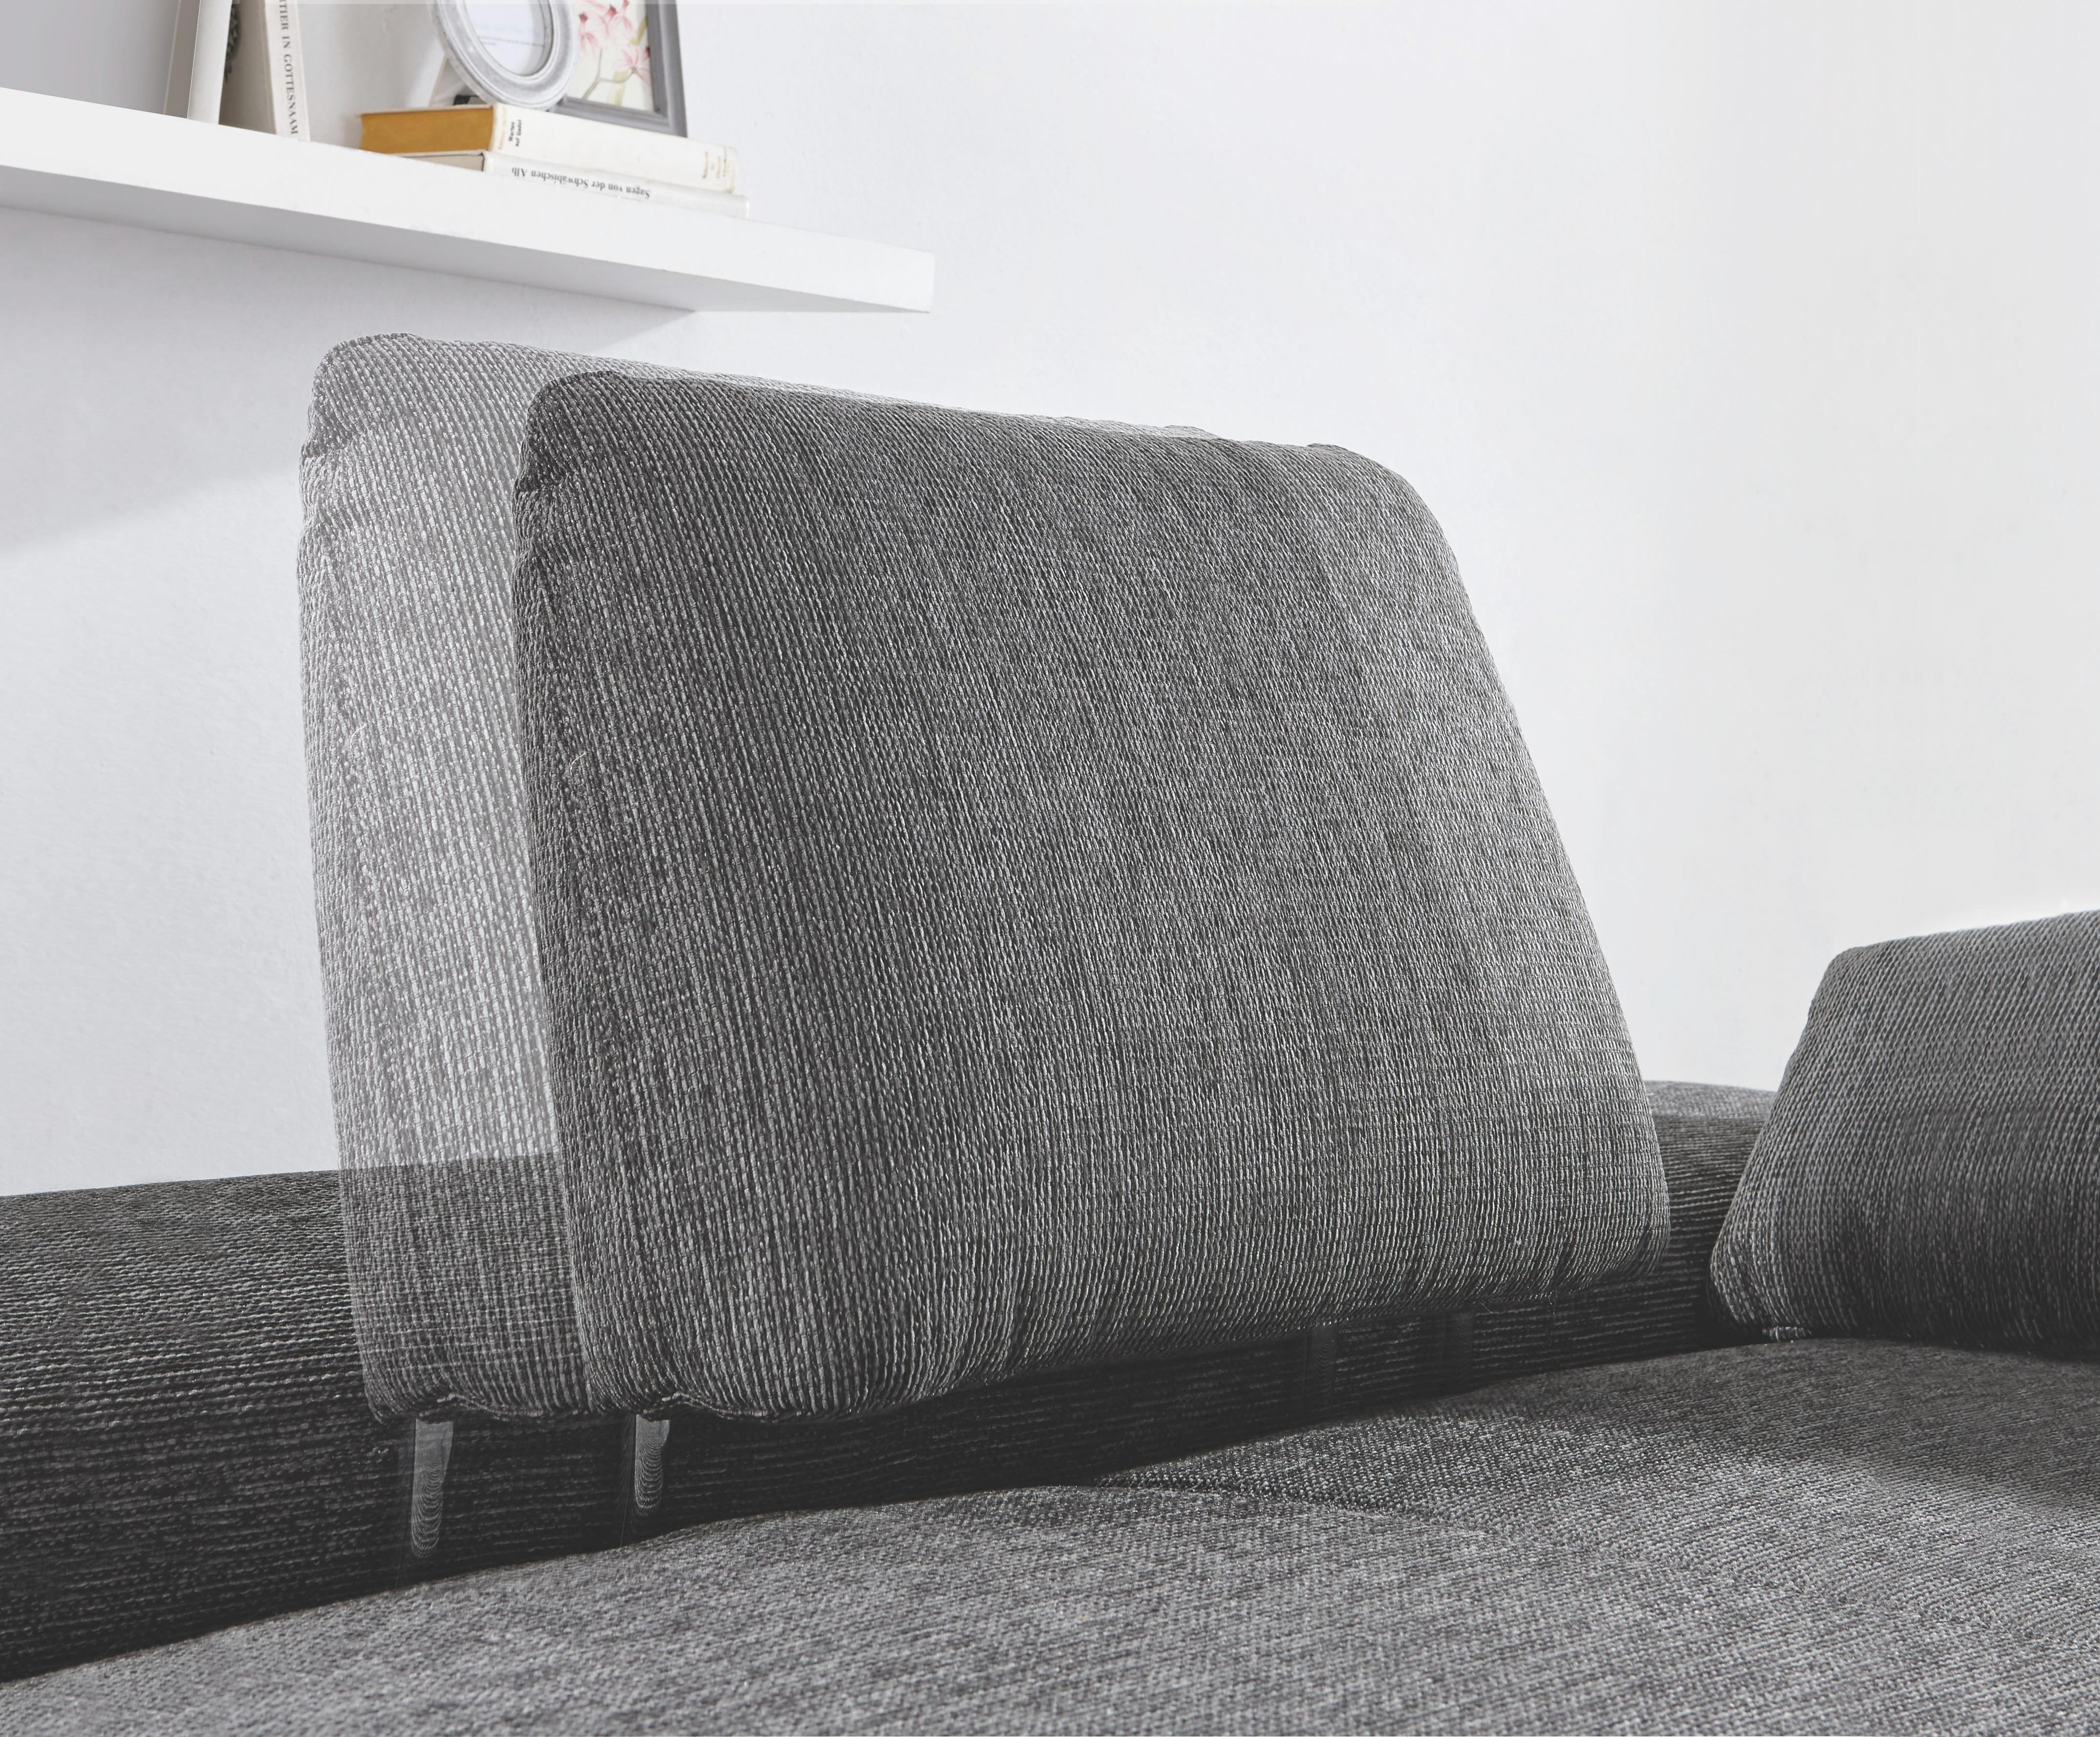 Ecksofa Flachgewebe, Lederlook Nierenkissen - Chromfarben/Weiß, Design, Textil/Metall (203/310cm) - VENDA